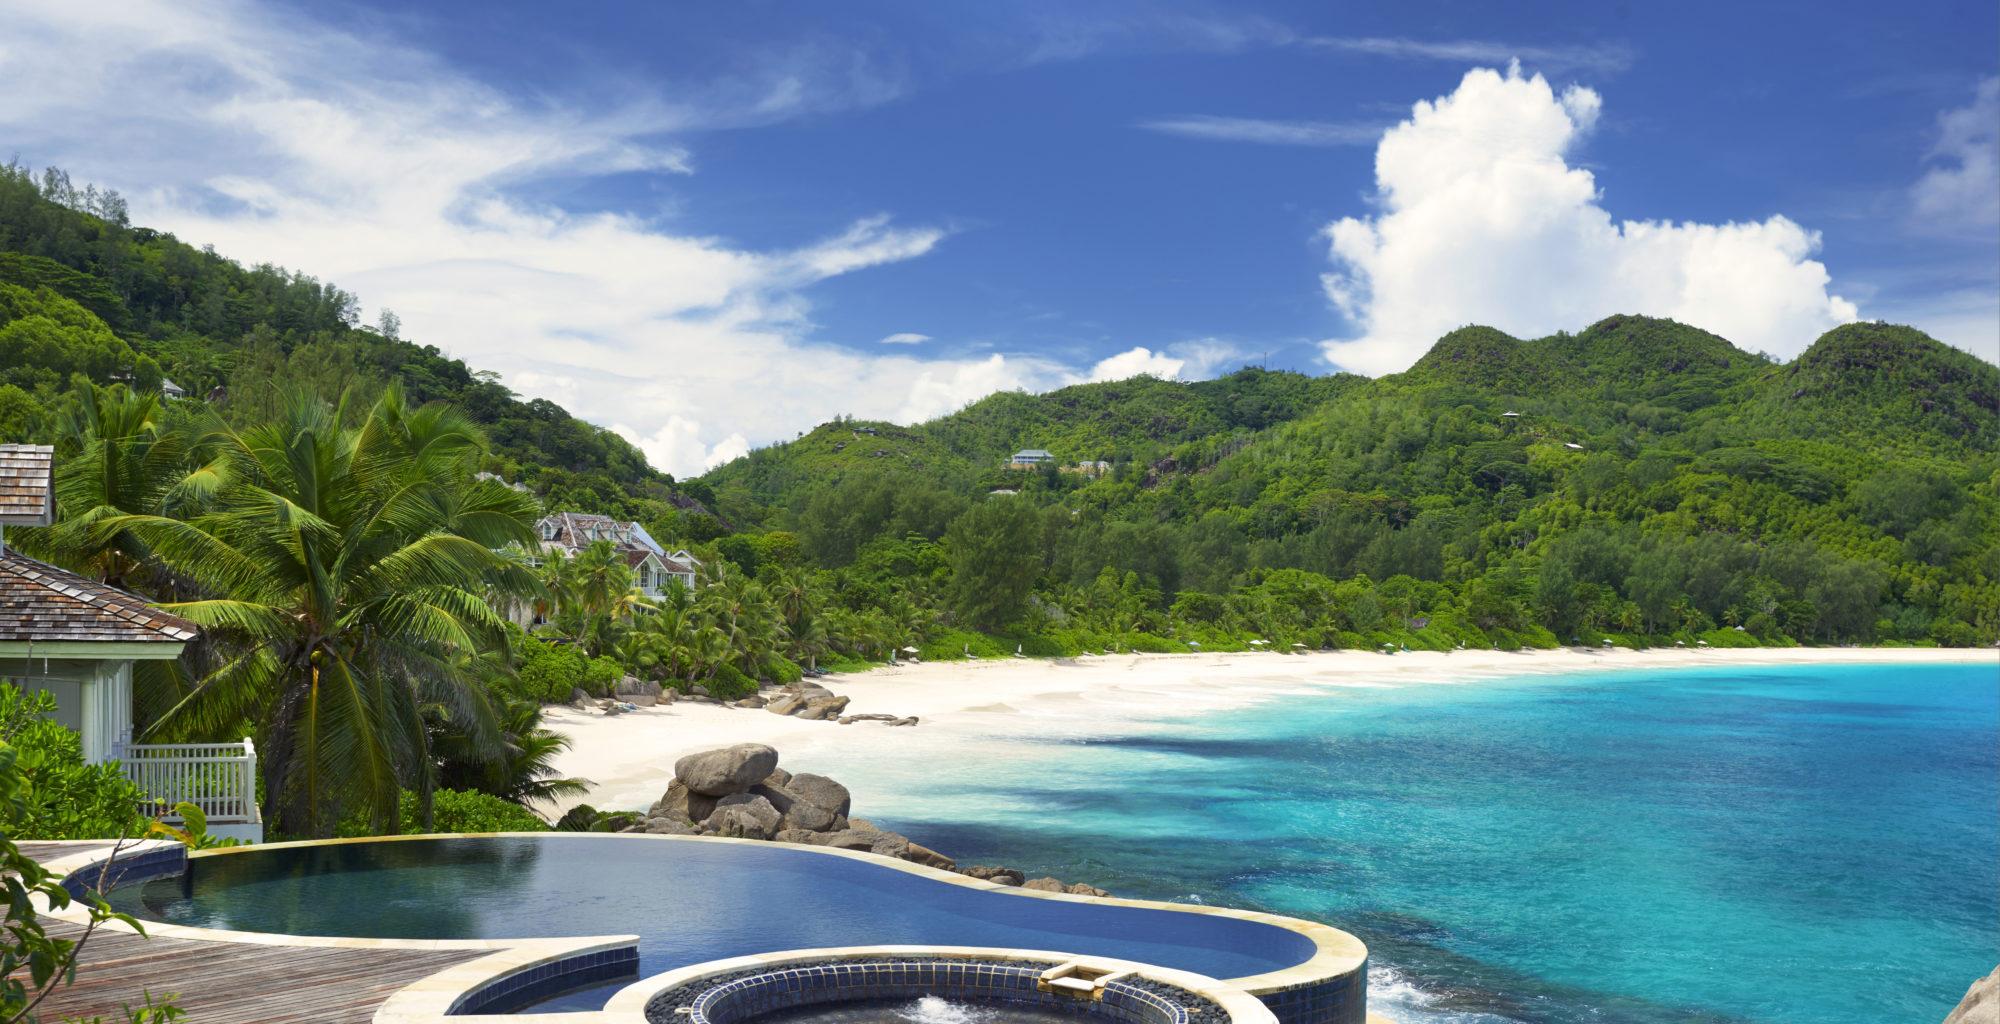 Banyan Tree Hotel Seychelles Pool Aerial